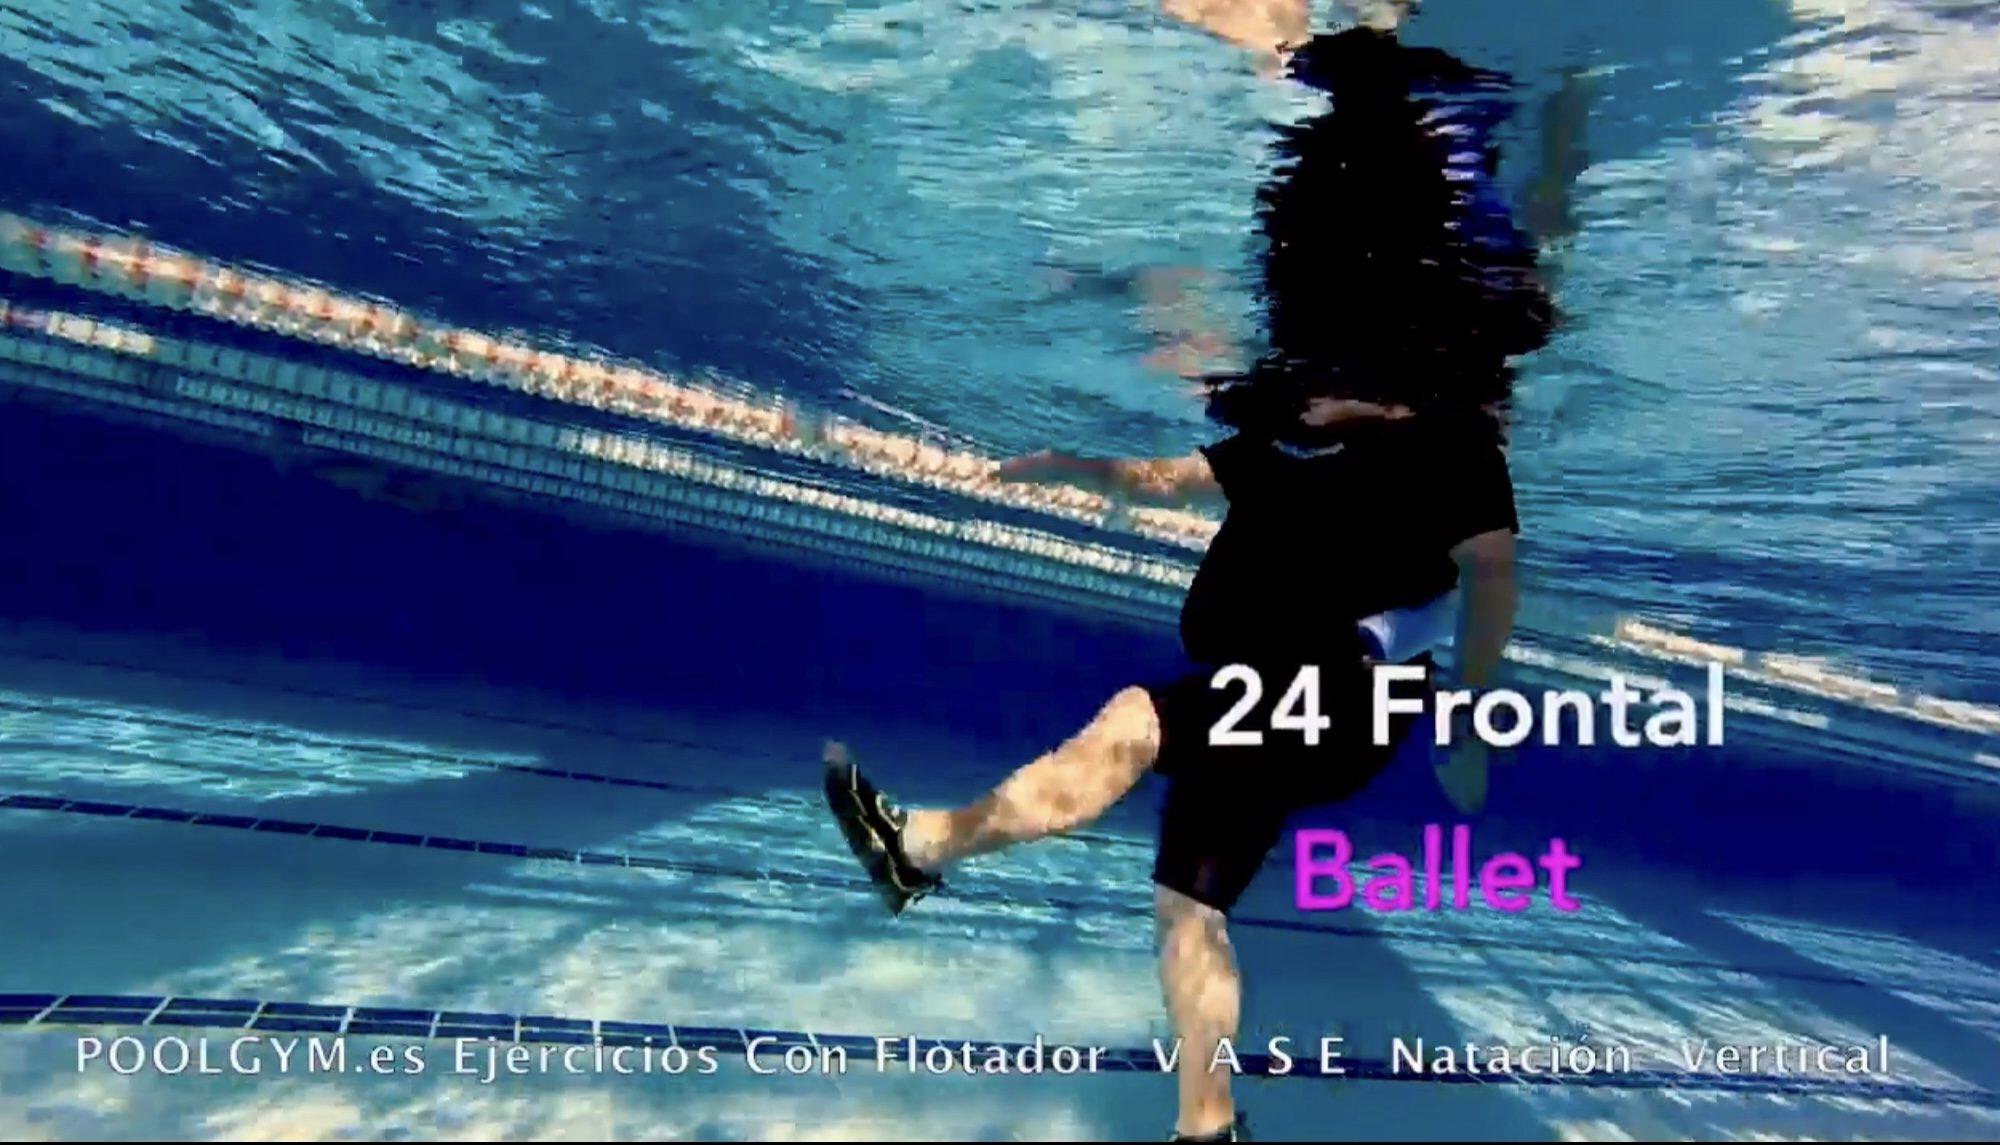 24 Frontal BALLET poolgym.ES